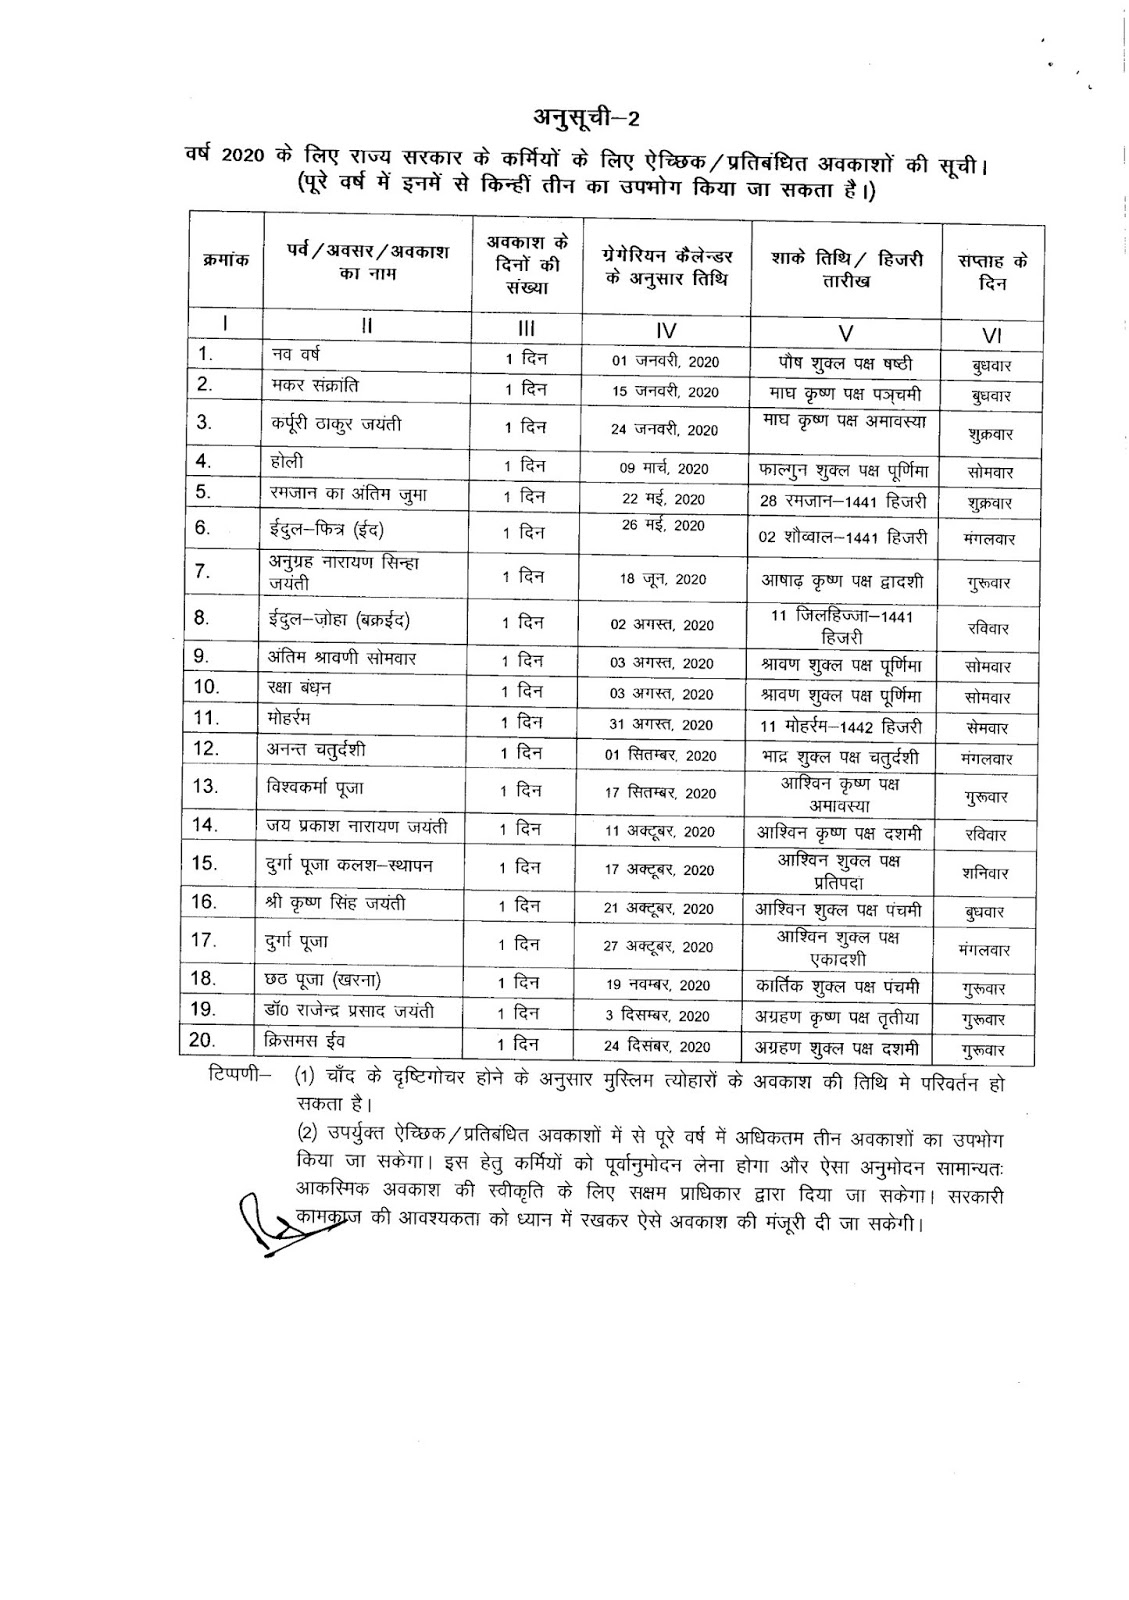 Bihar Government Calendar 2020 #educratsweb regarding Bihar Sarkar Calender